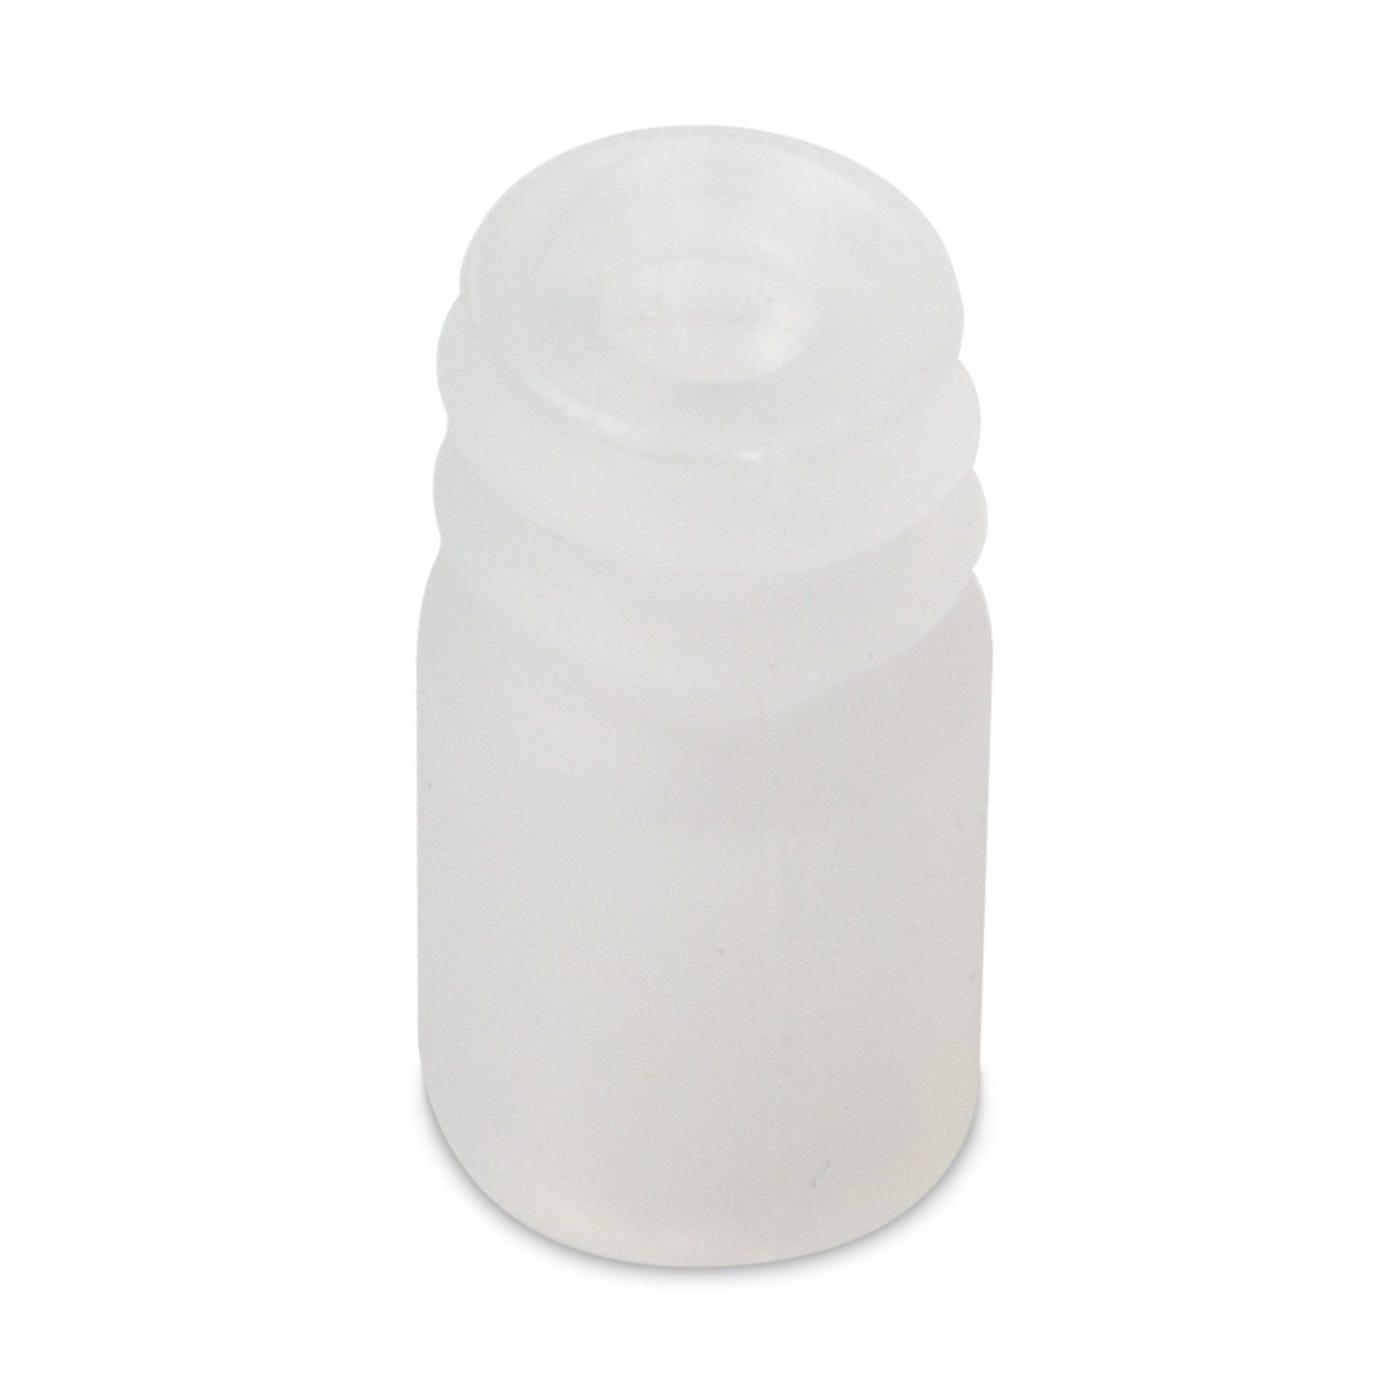 Dental Finishing & Polishing Kit - LumiGrip Suction Tip Kit